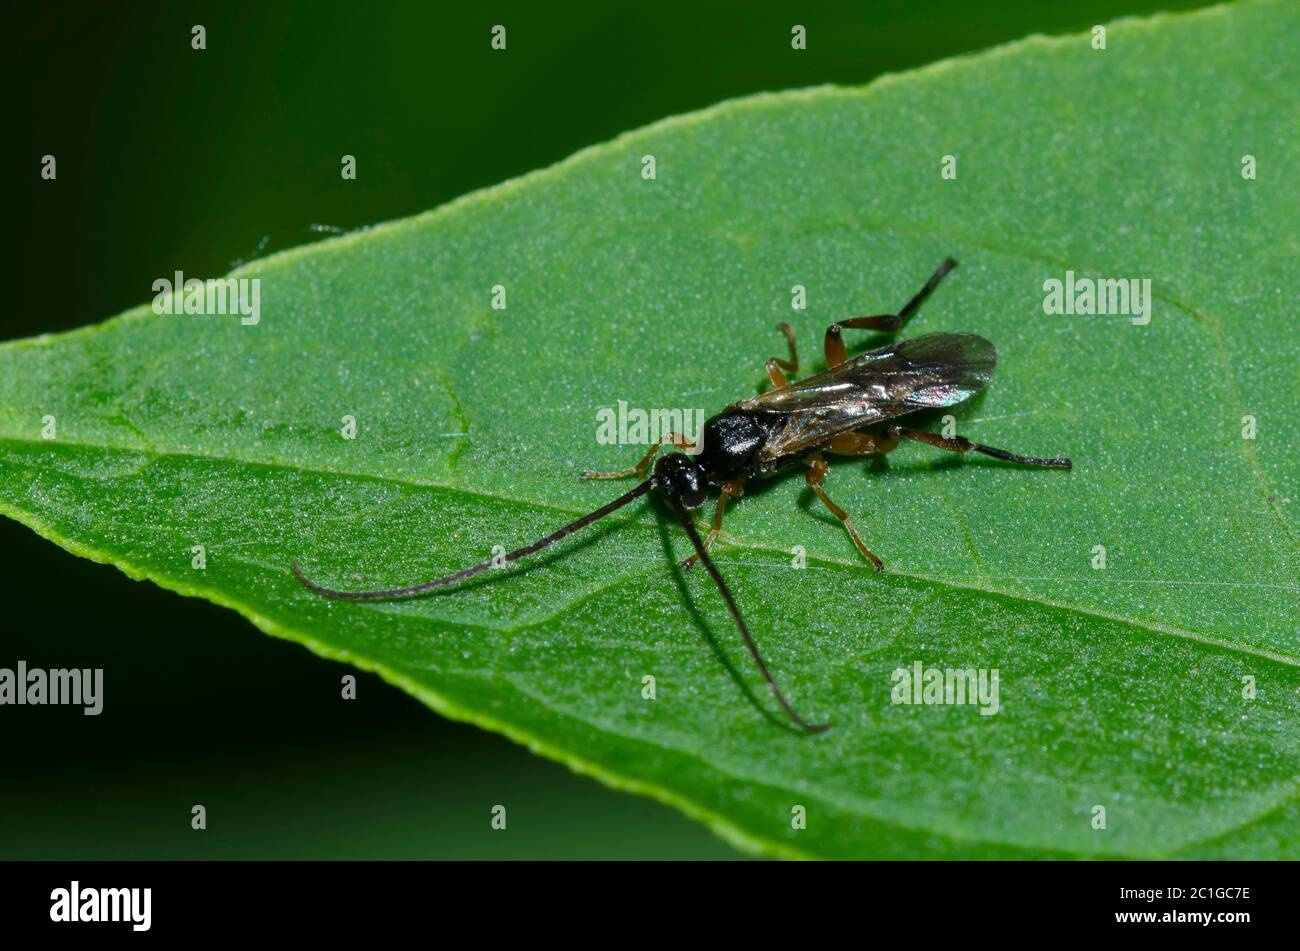 Braconid Wasp, Superfamilia Ichneumonoidea Foto de stock